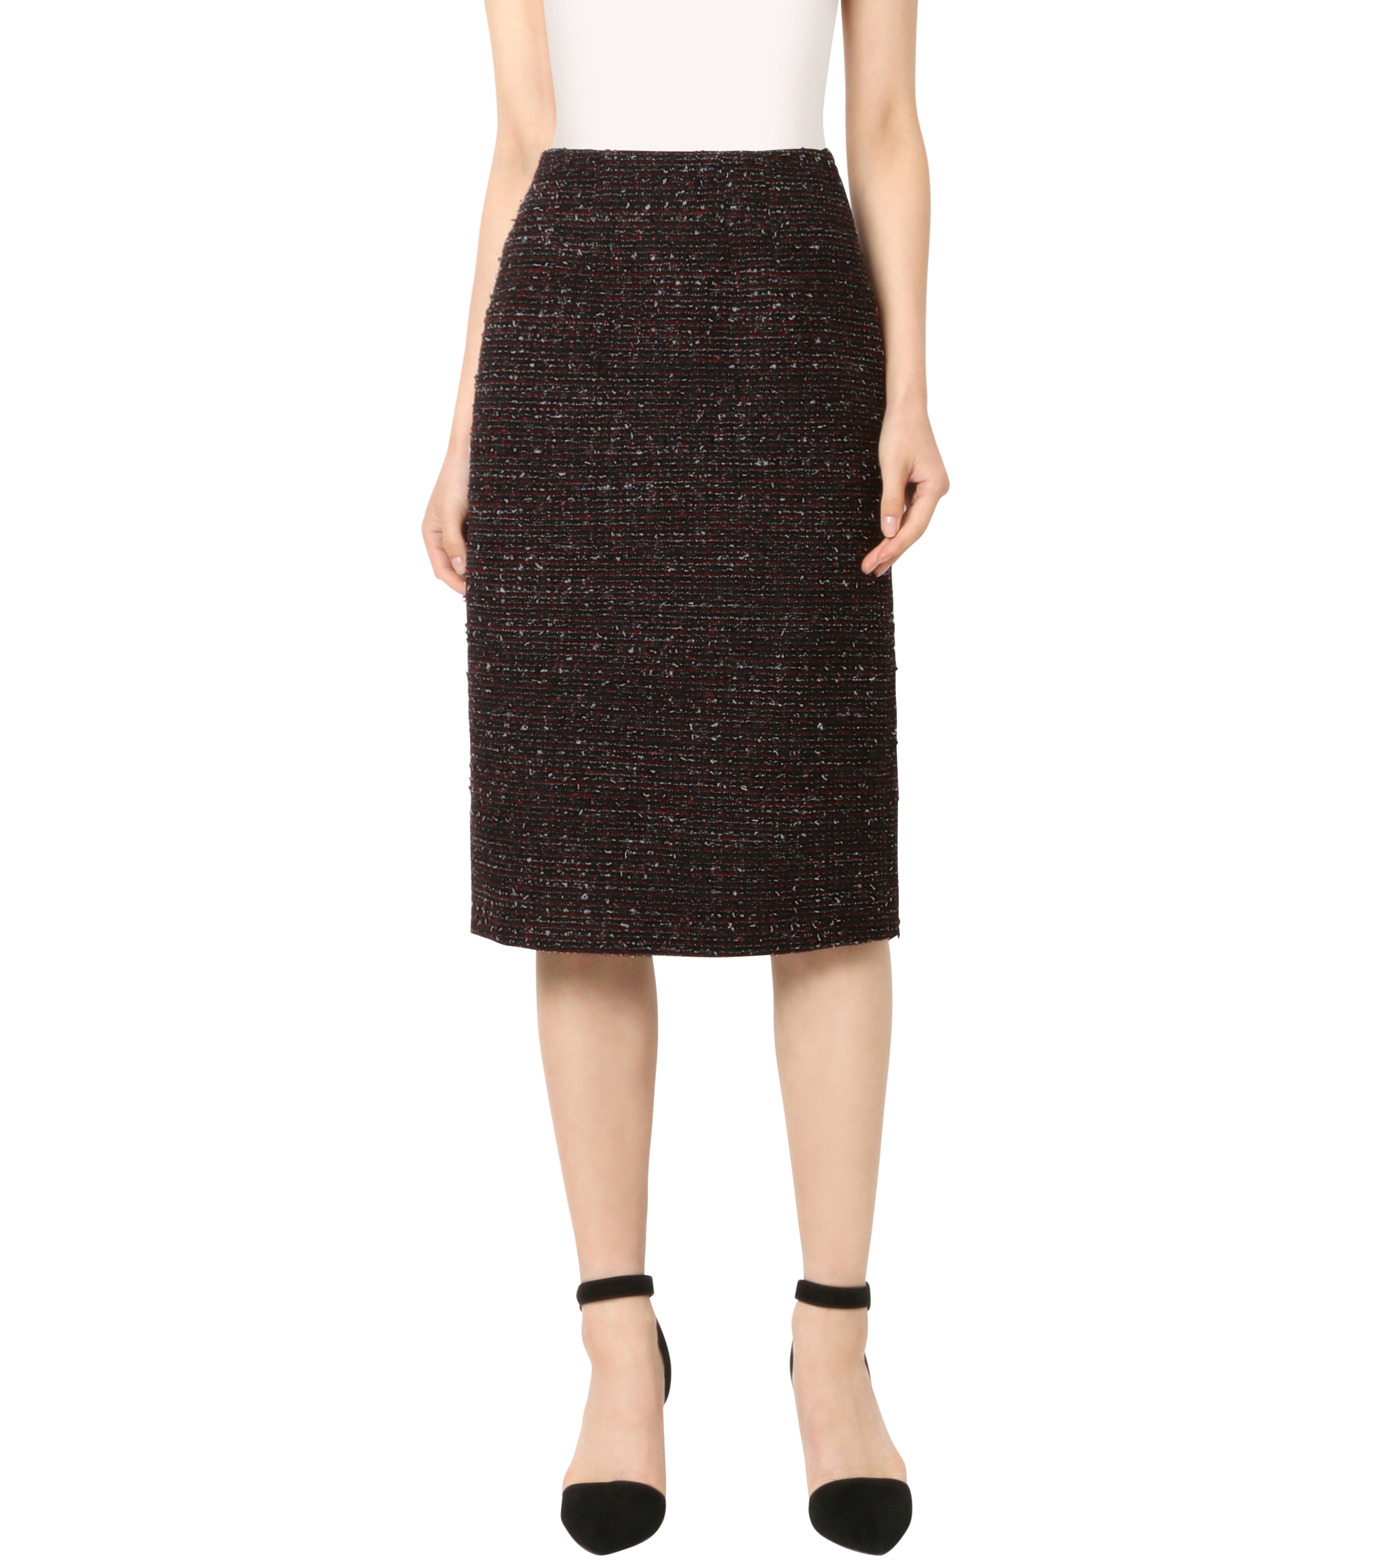 Altuzarra(アルトゥザラ)のTweed Pencil Skirt-BLACK(スカート/skirt)-316-501-465-13 拡大詳細画像1